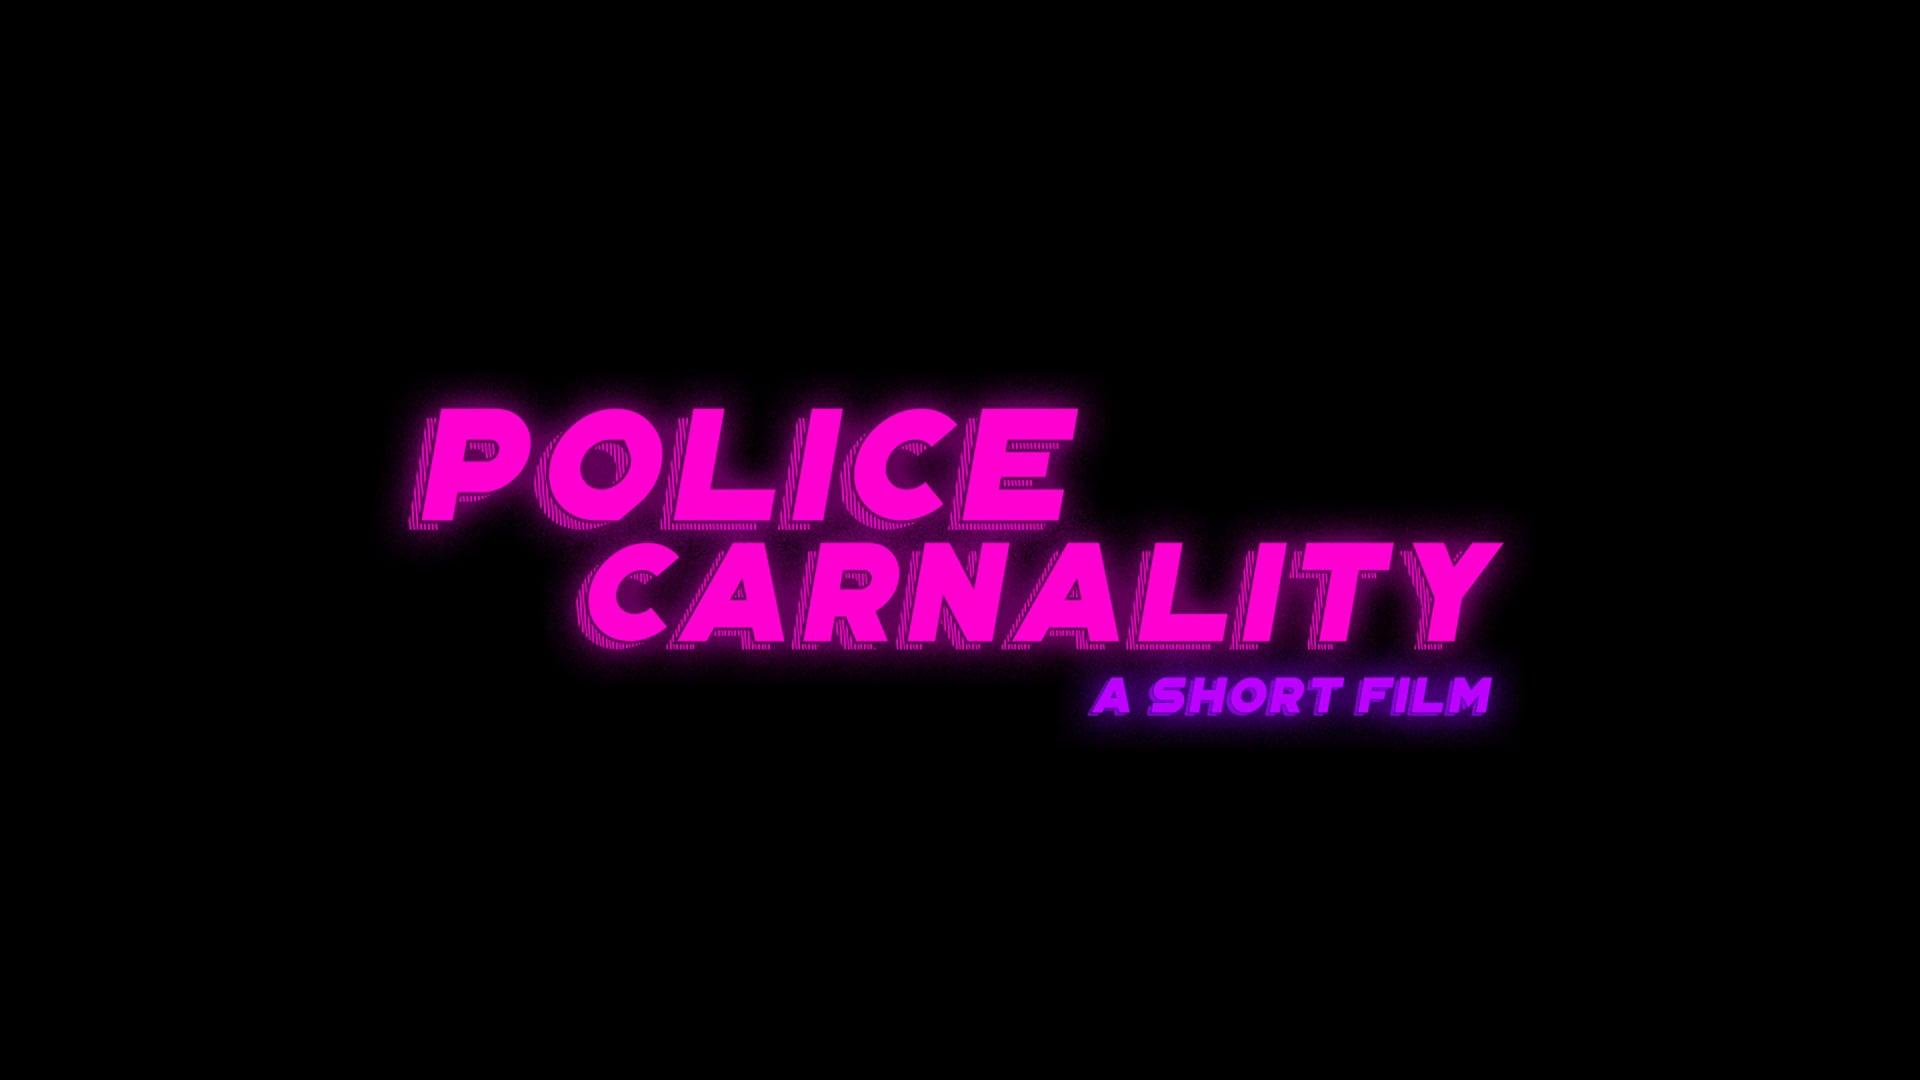 Police Carnality